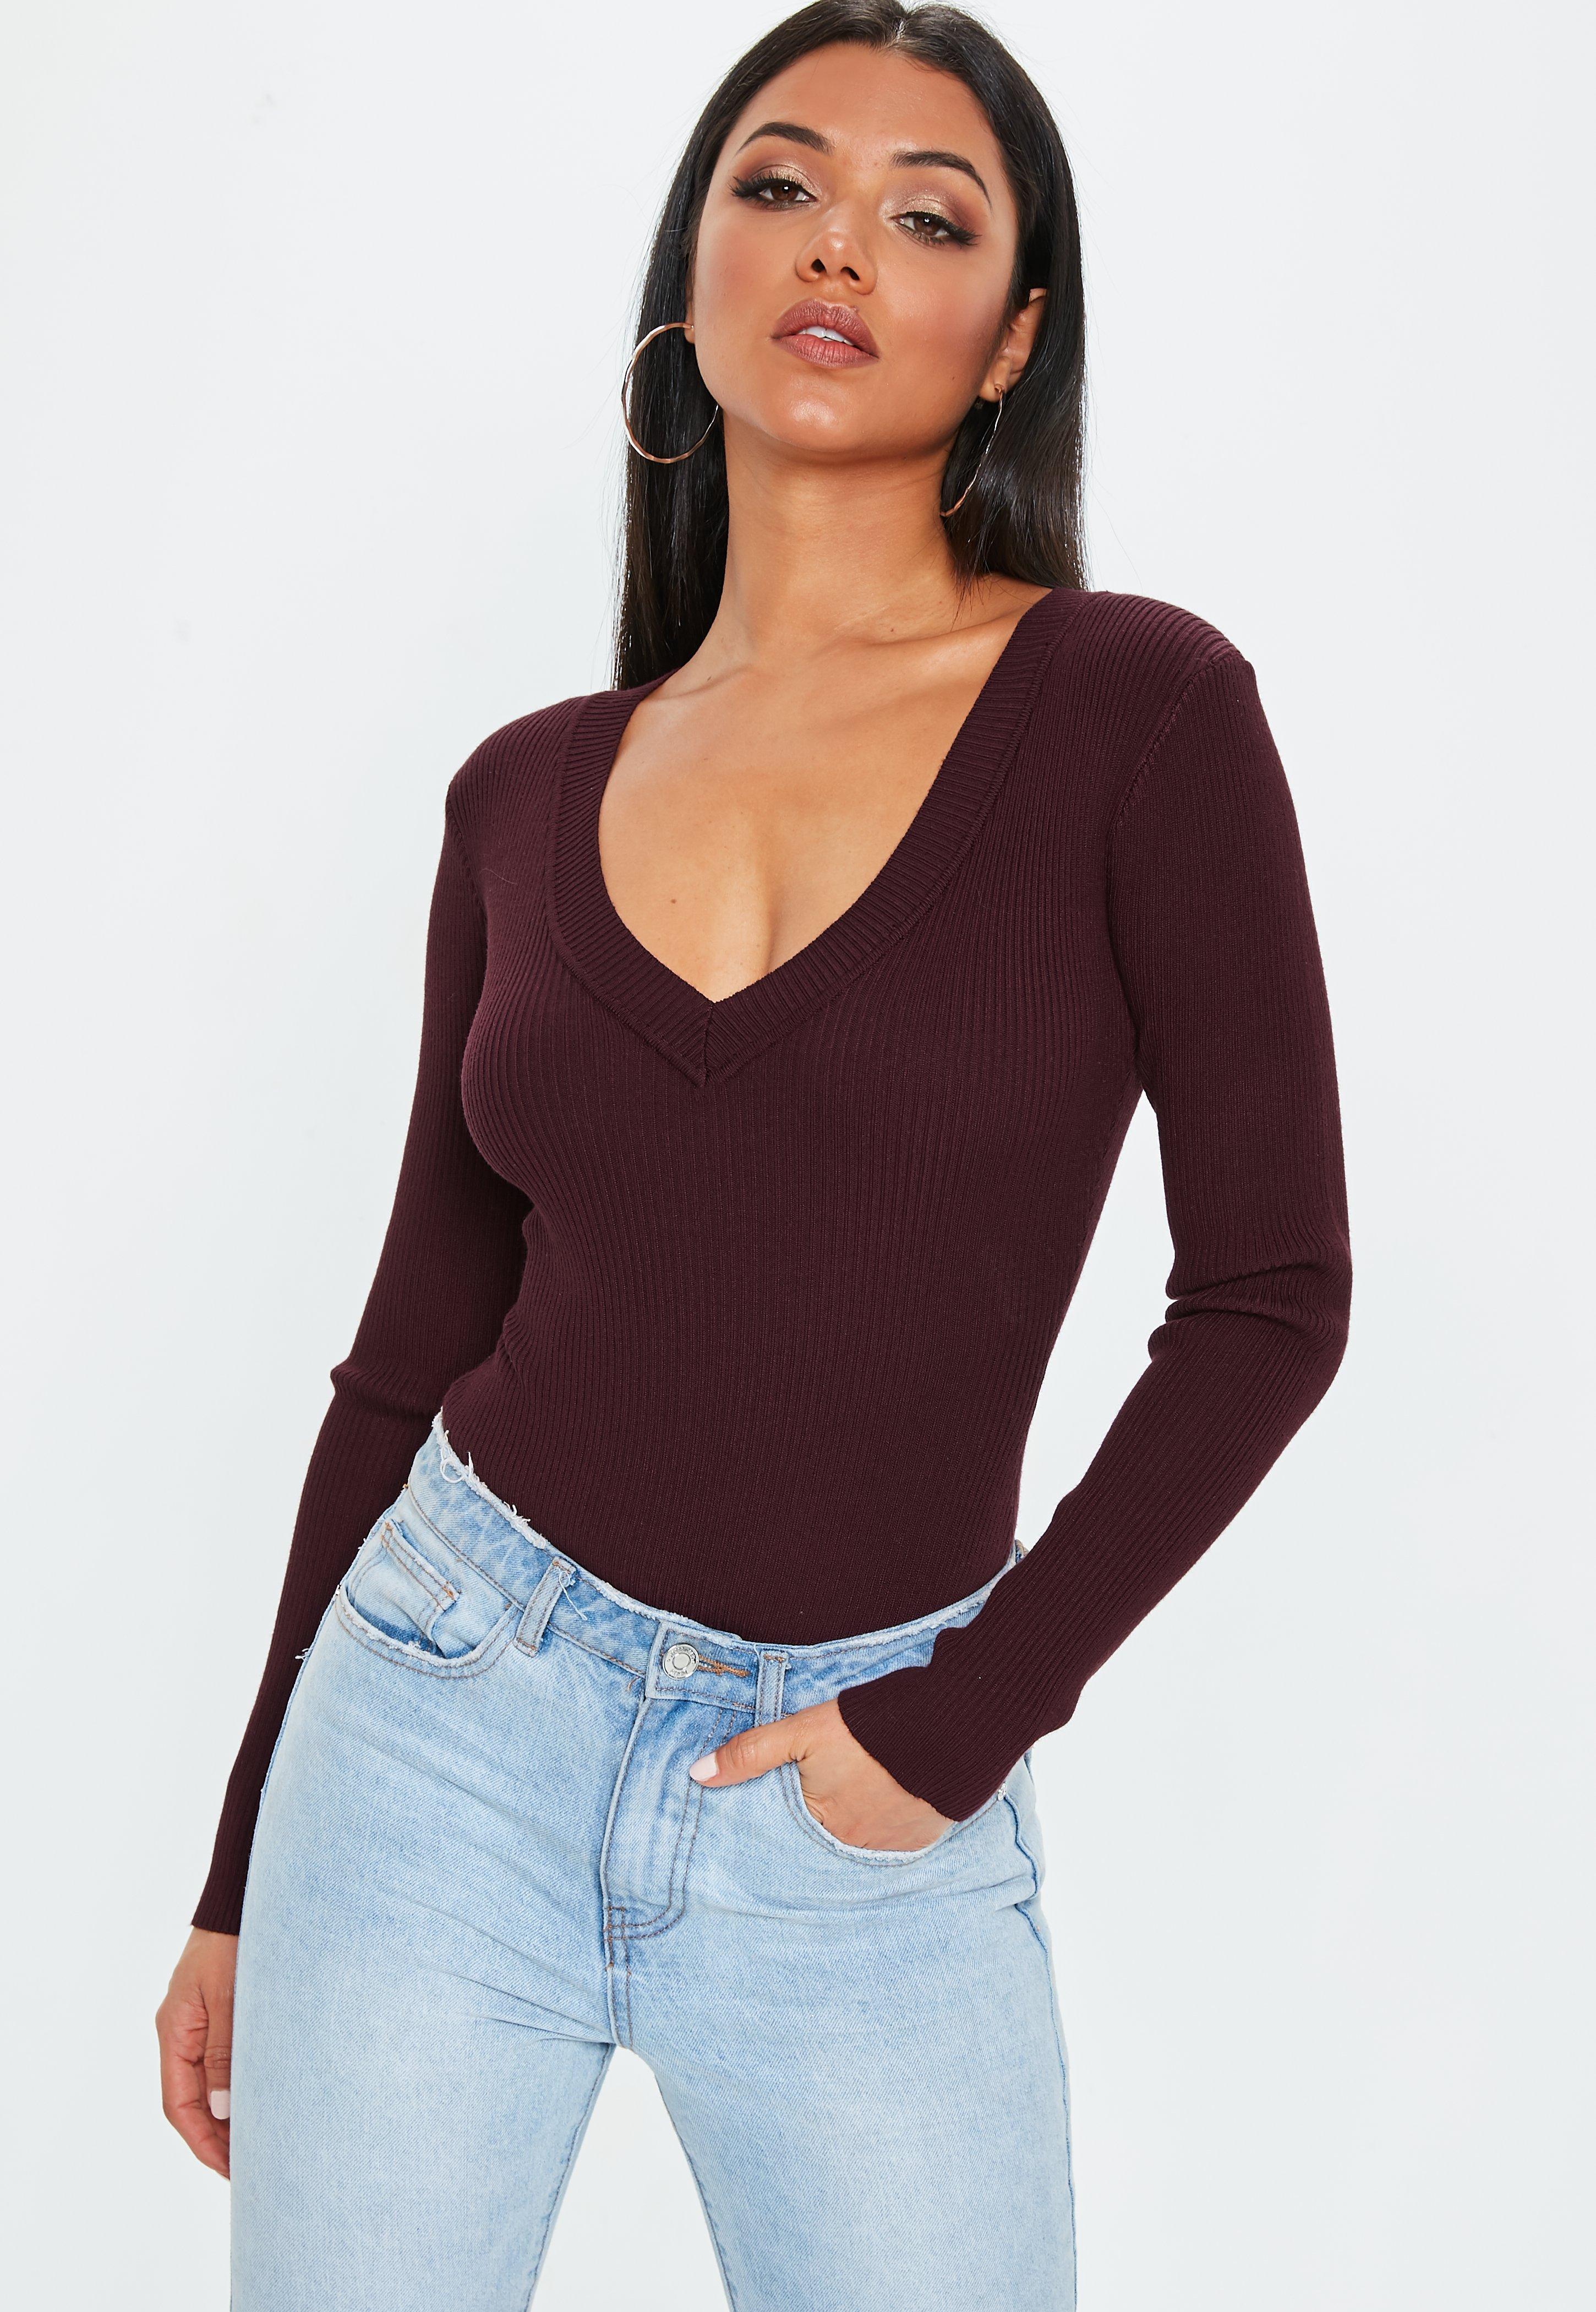 70de3d94b5 Lyst - Missguided Wine Ultimate Plunge Knitted Bodysuit in Purple